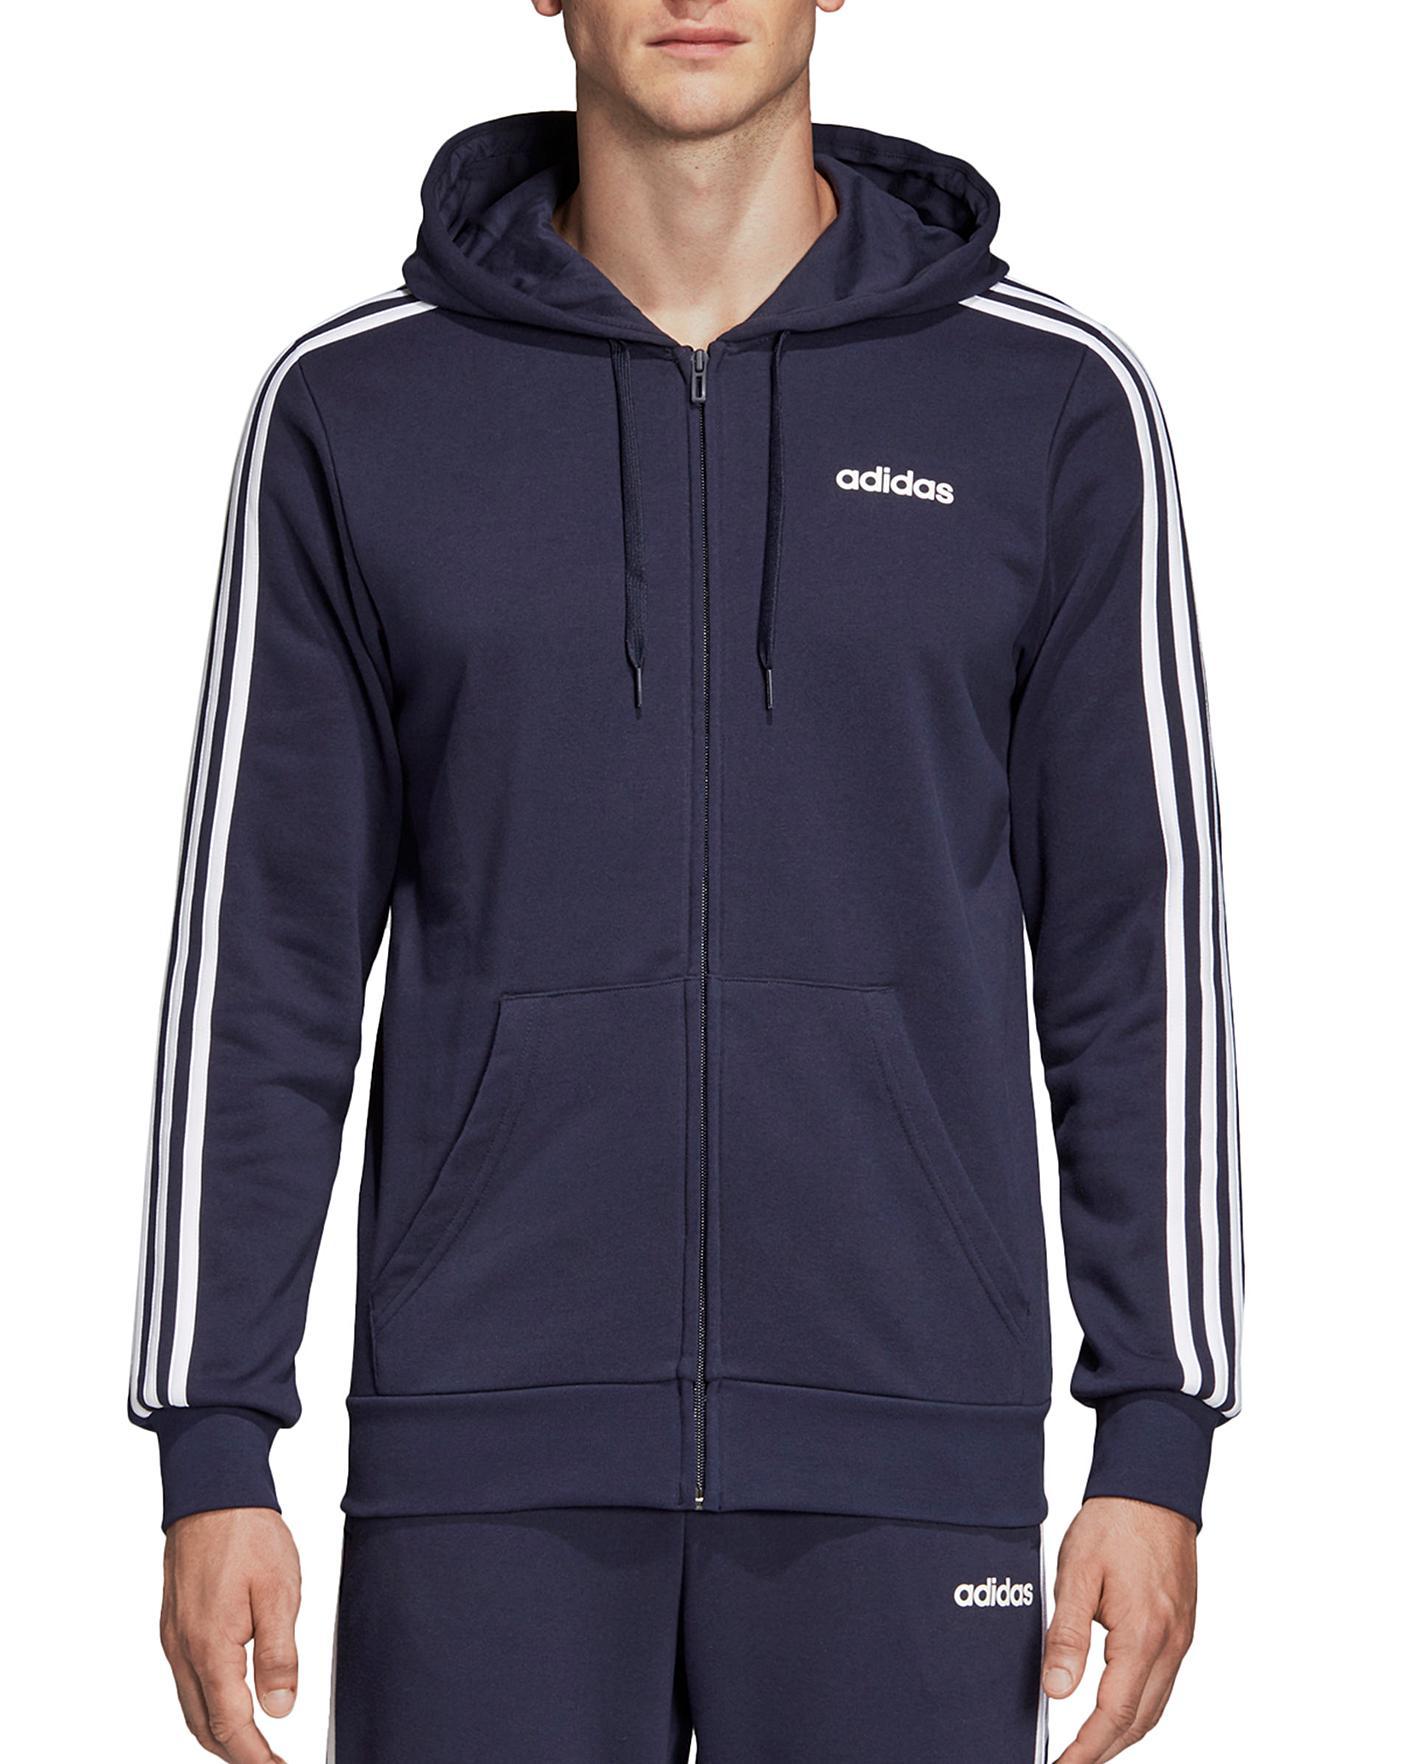 Adidas Essentials 3 Stripe Full Zip Hoodie (S - XXL) £24.38 With Code & Free Delivery @ Jacamo